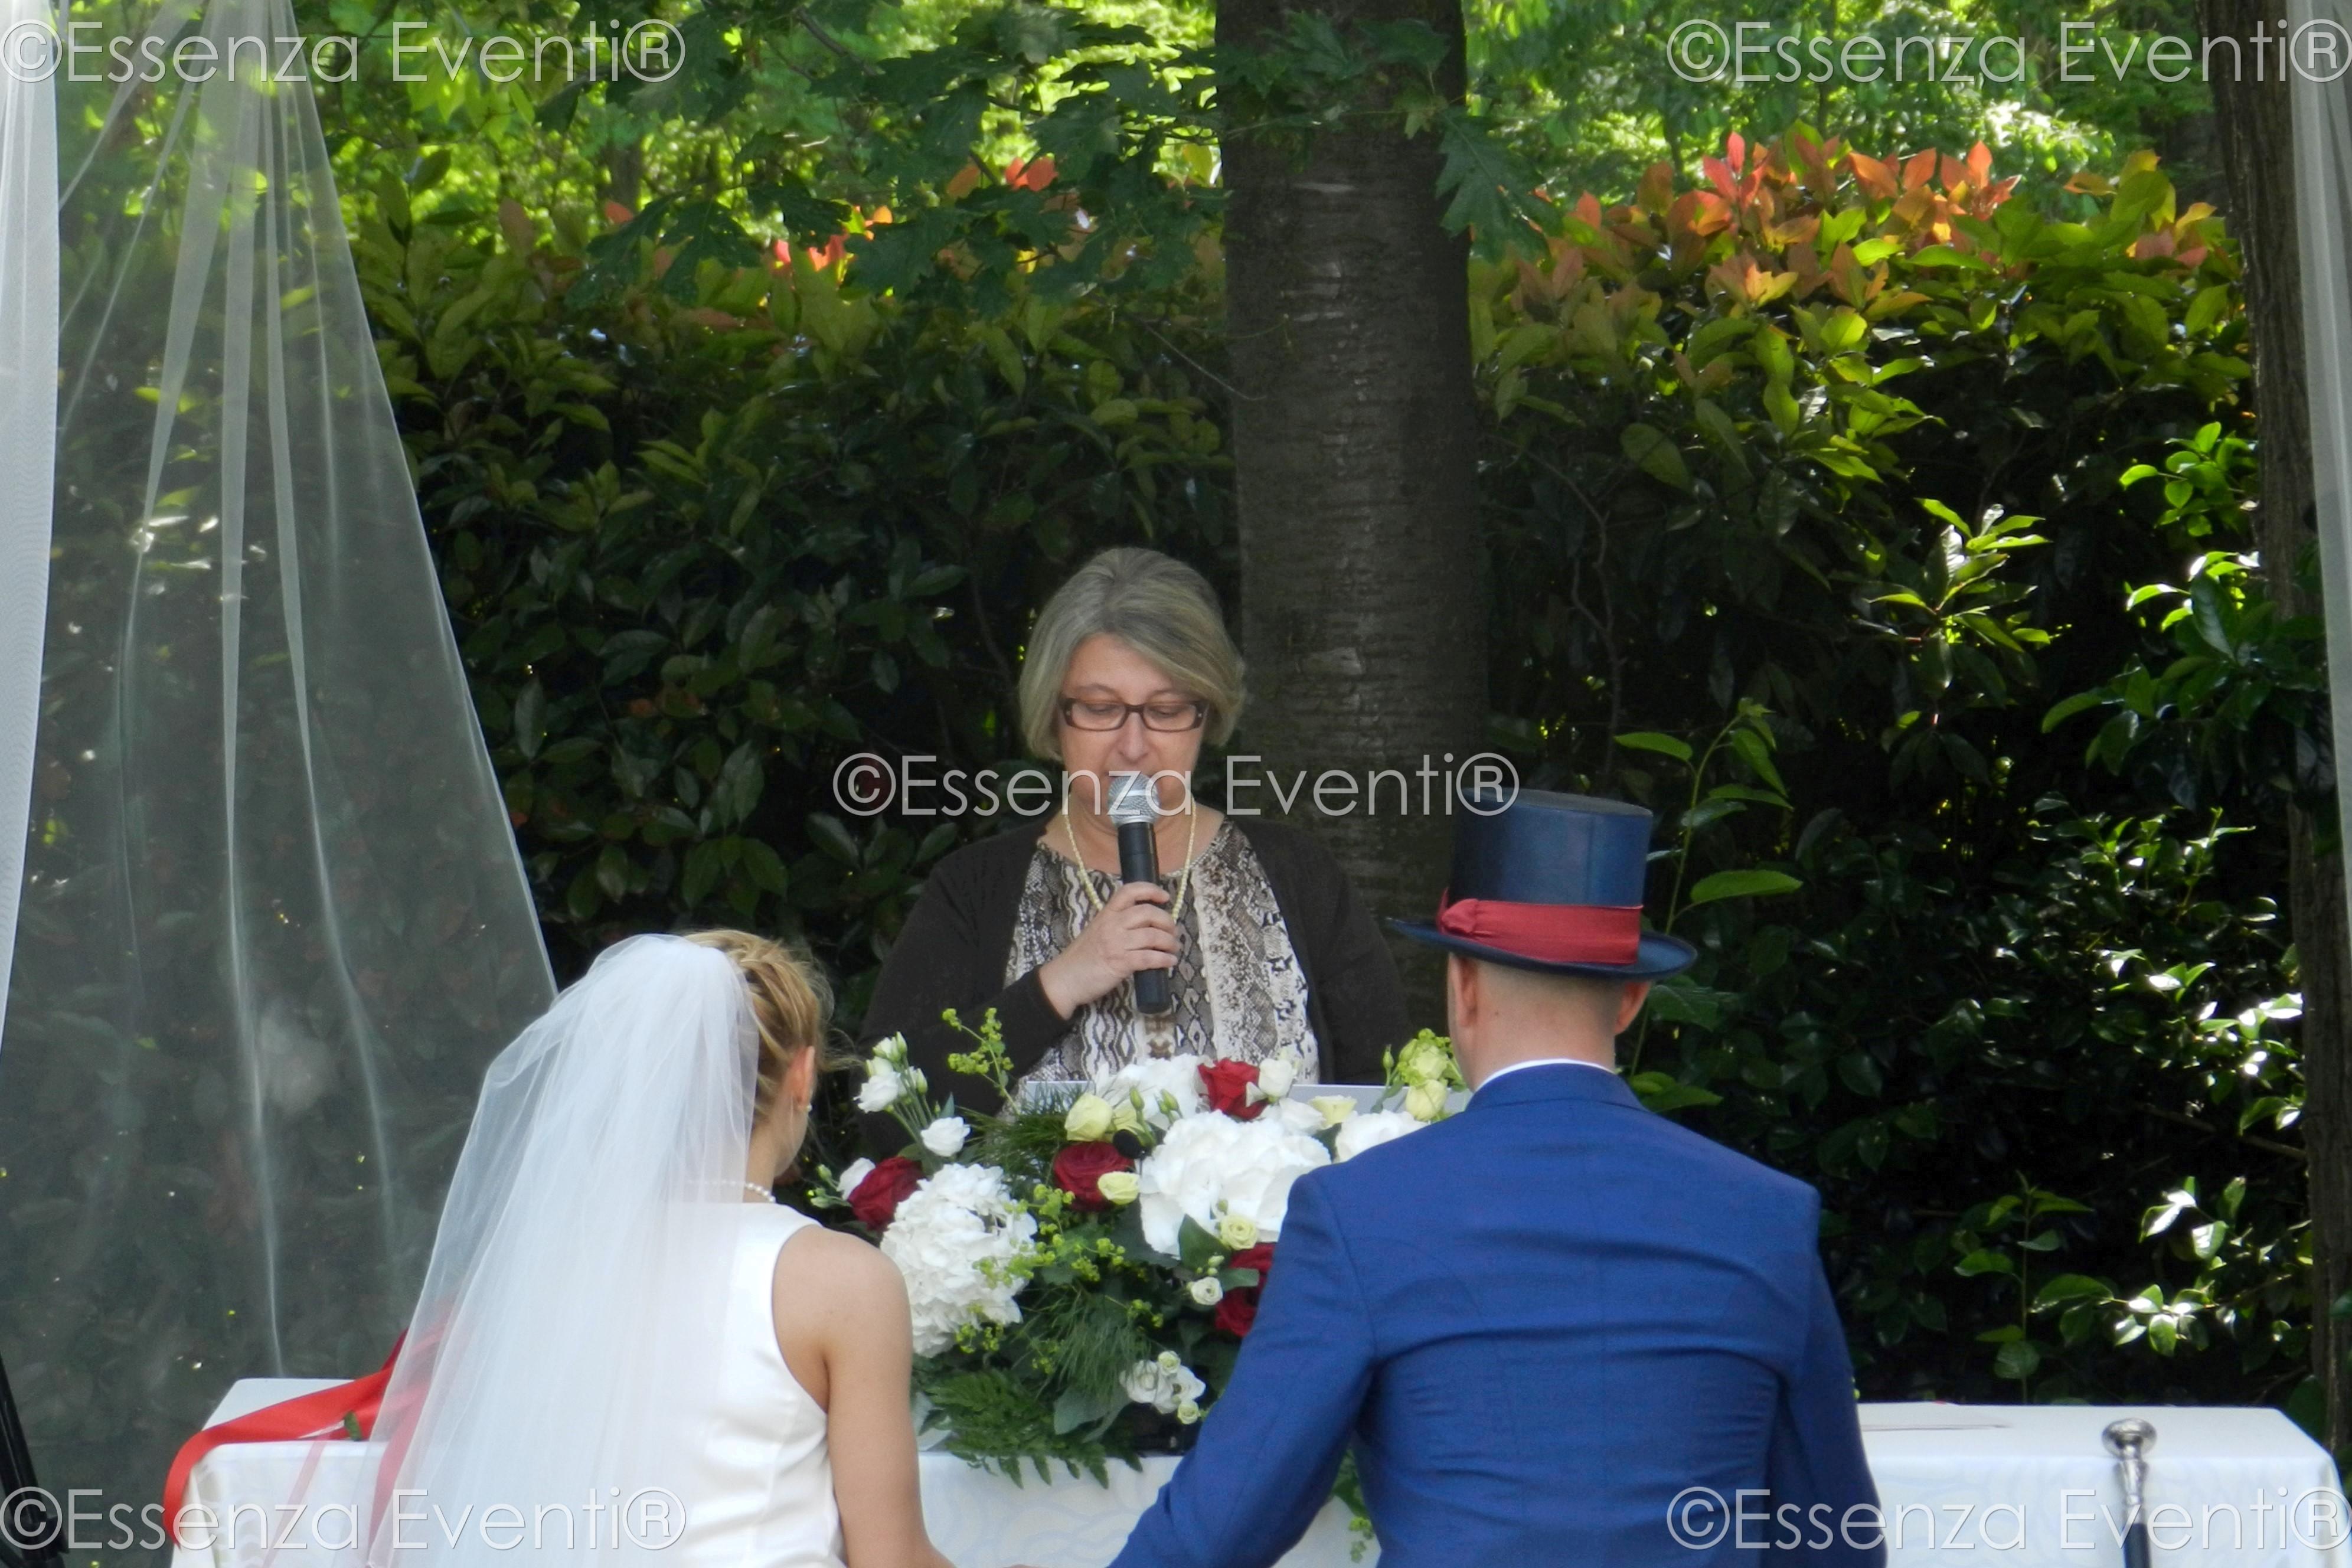 Celebrante Matrimonio Simbolico Veneto : Celebrante matrimonio simbolico essenza eventi